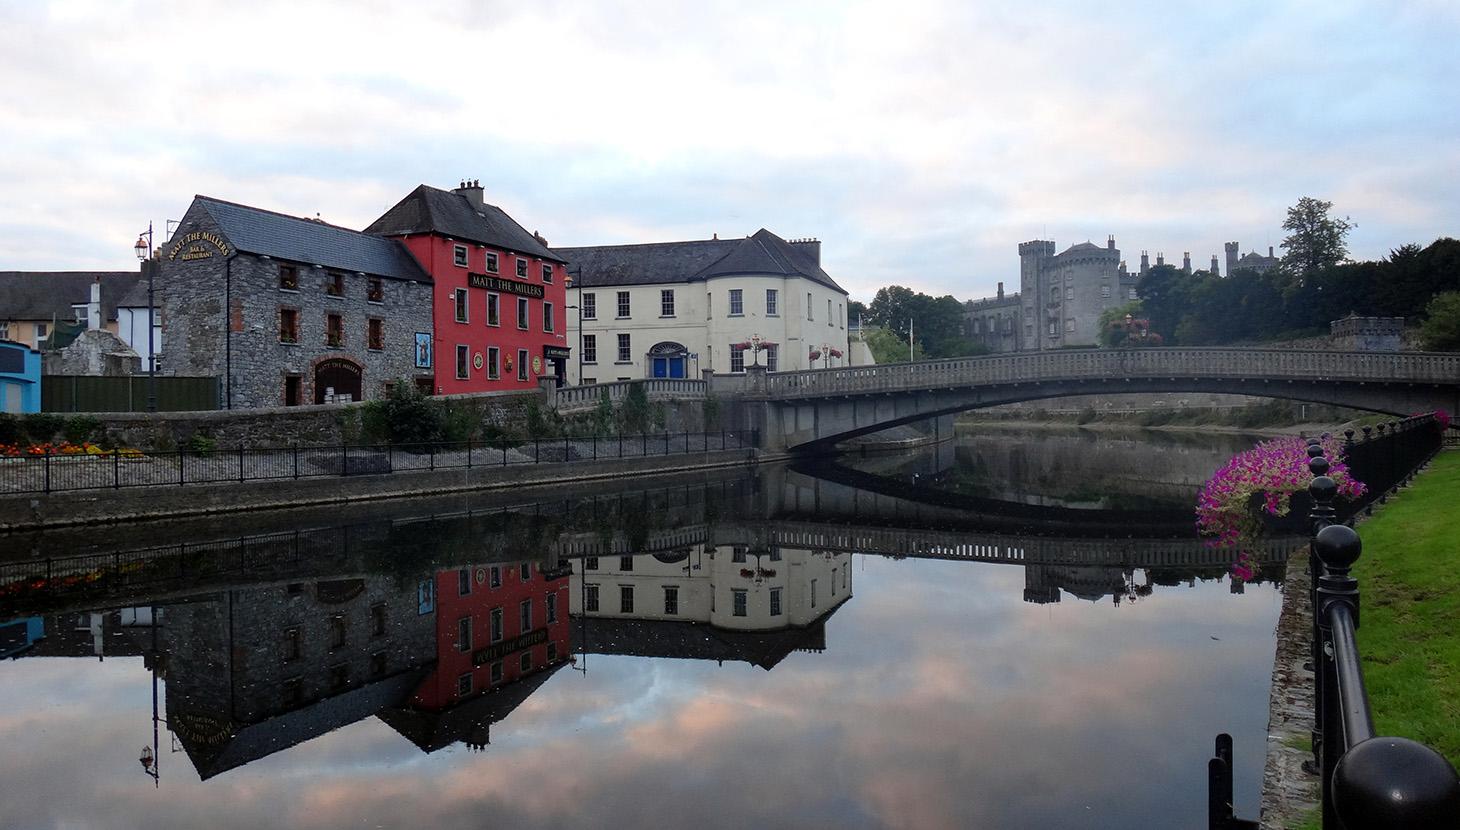 stefan-jurgensen-Johns-Bridge-River-Nore-1460